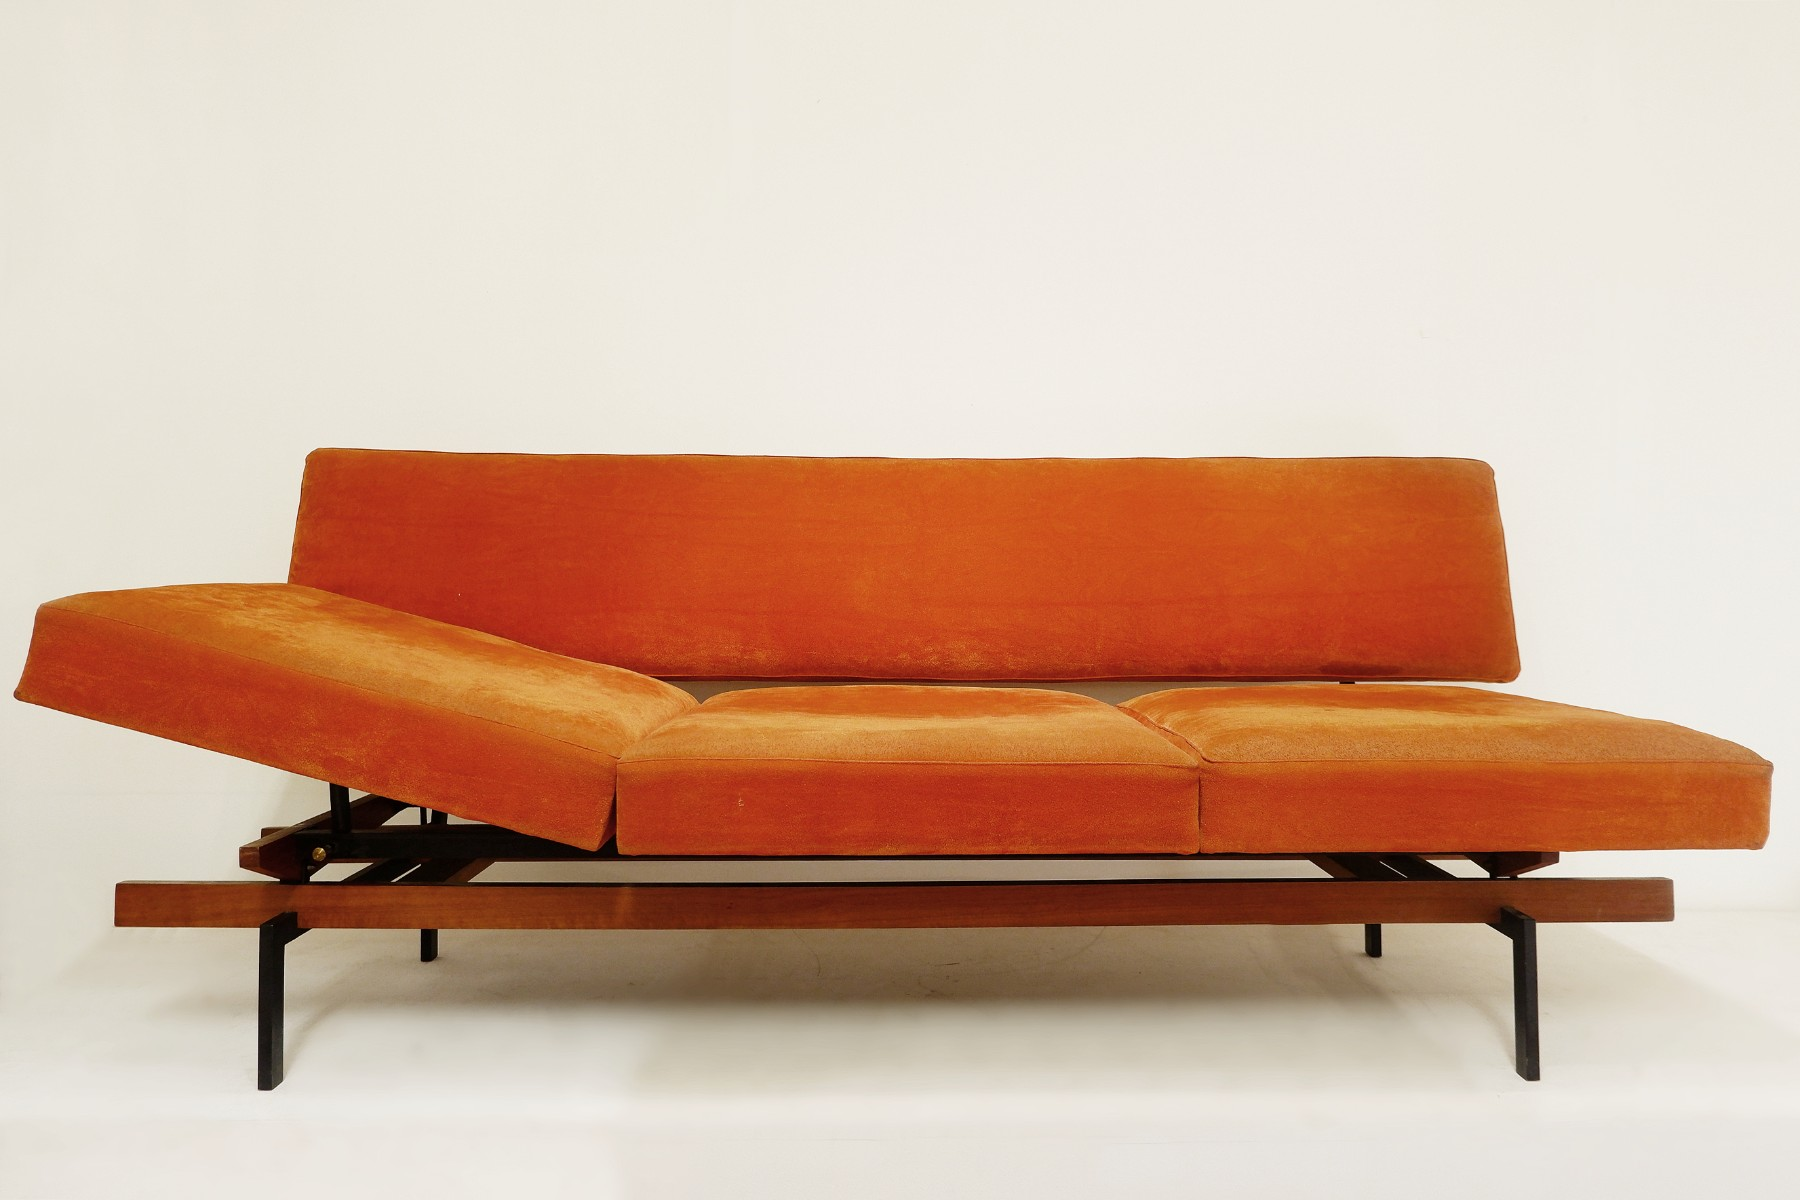 Italian Sofa Day bed - Adjustable seat height - Via Antica ...